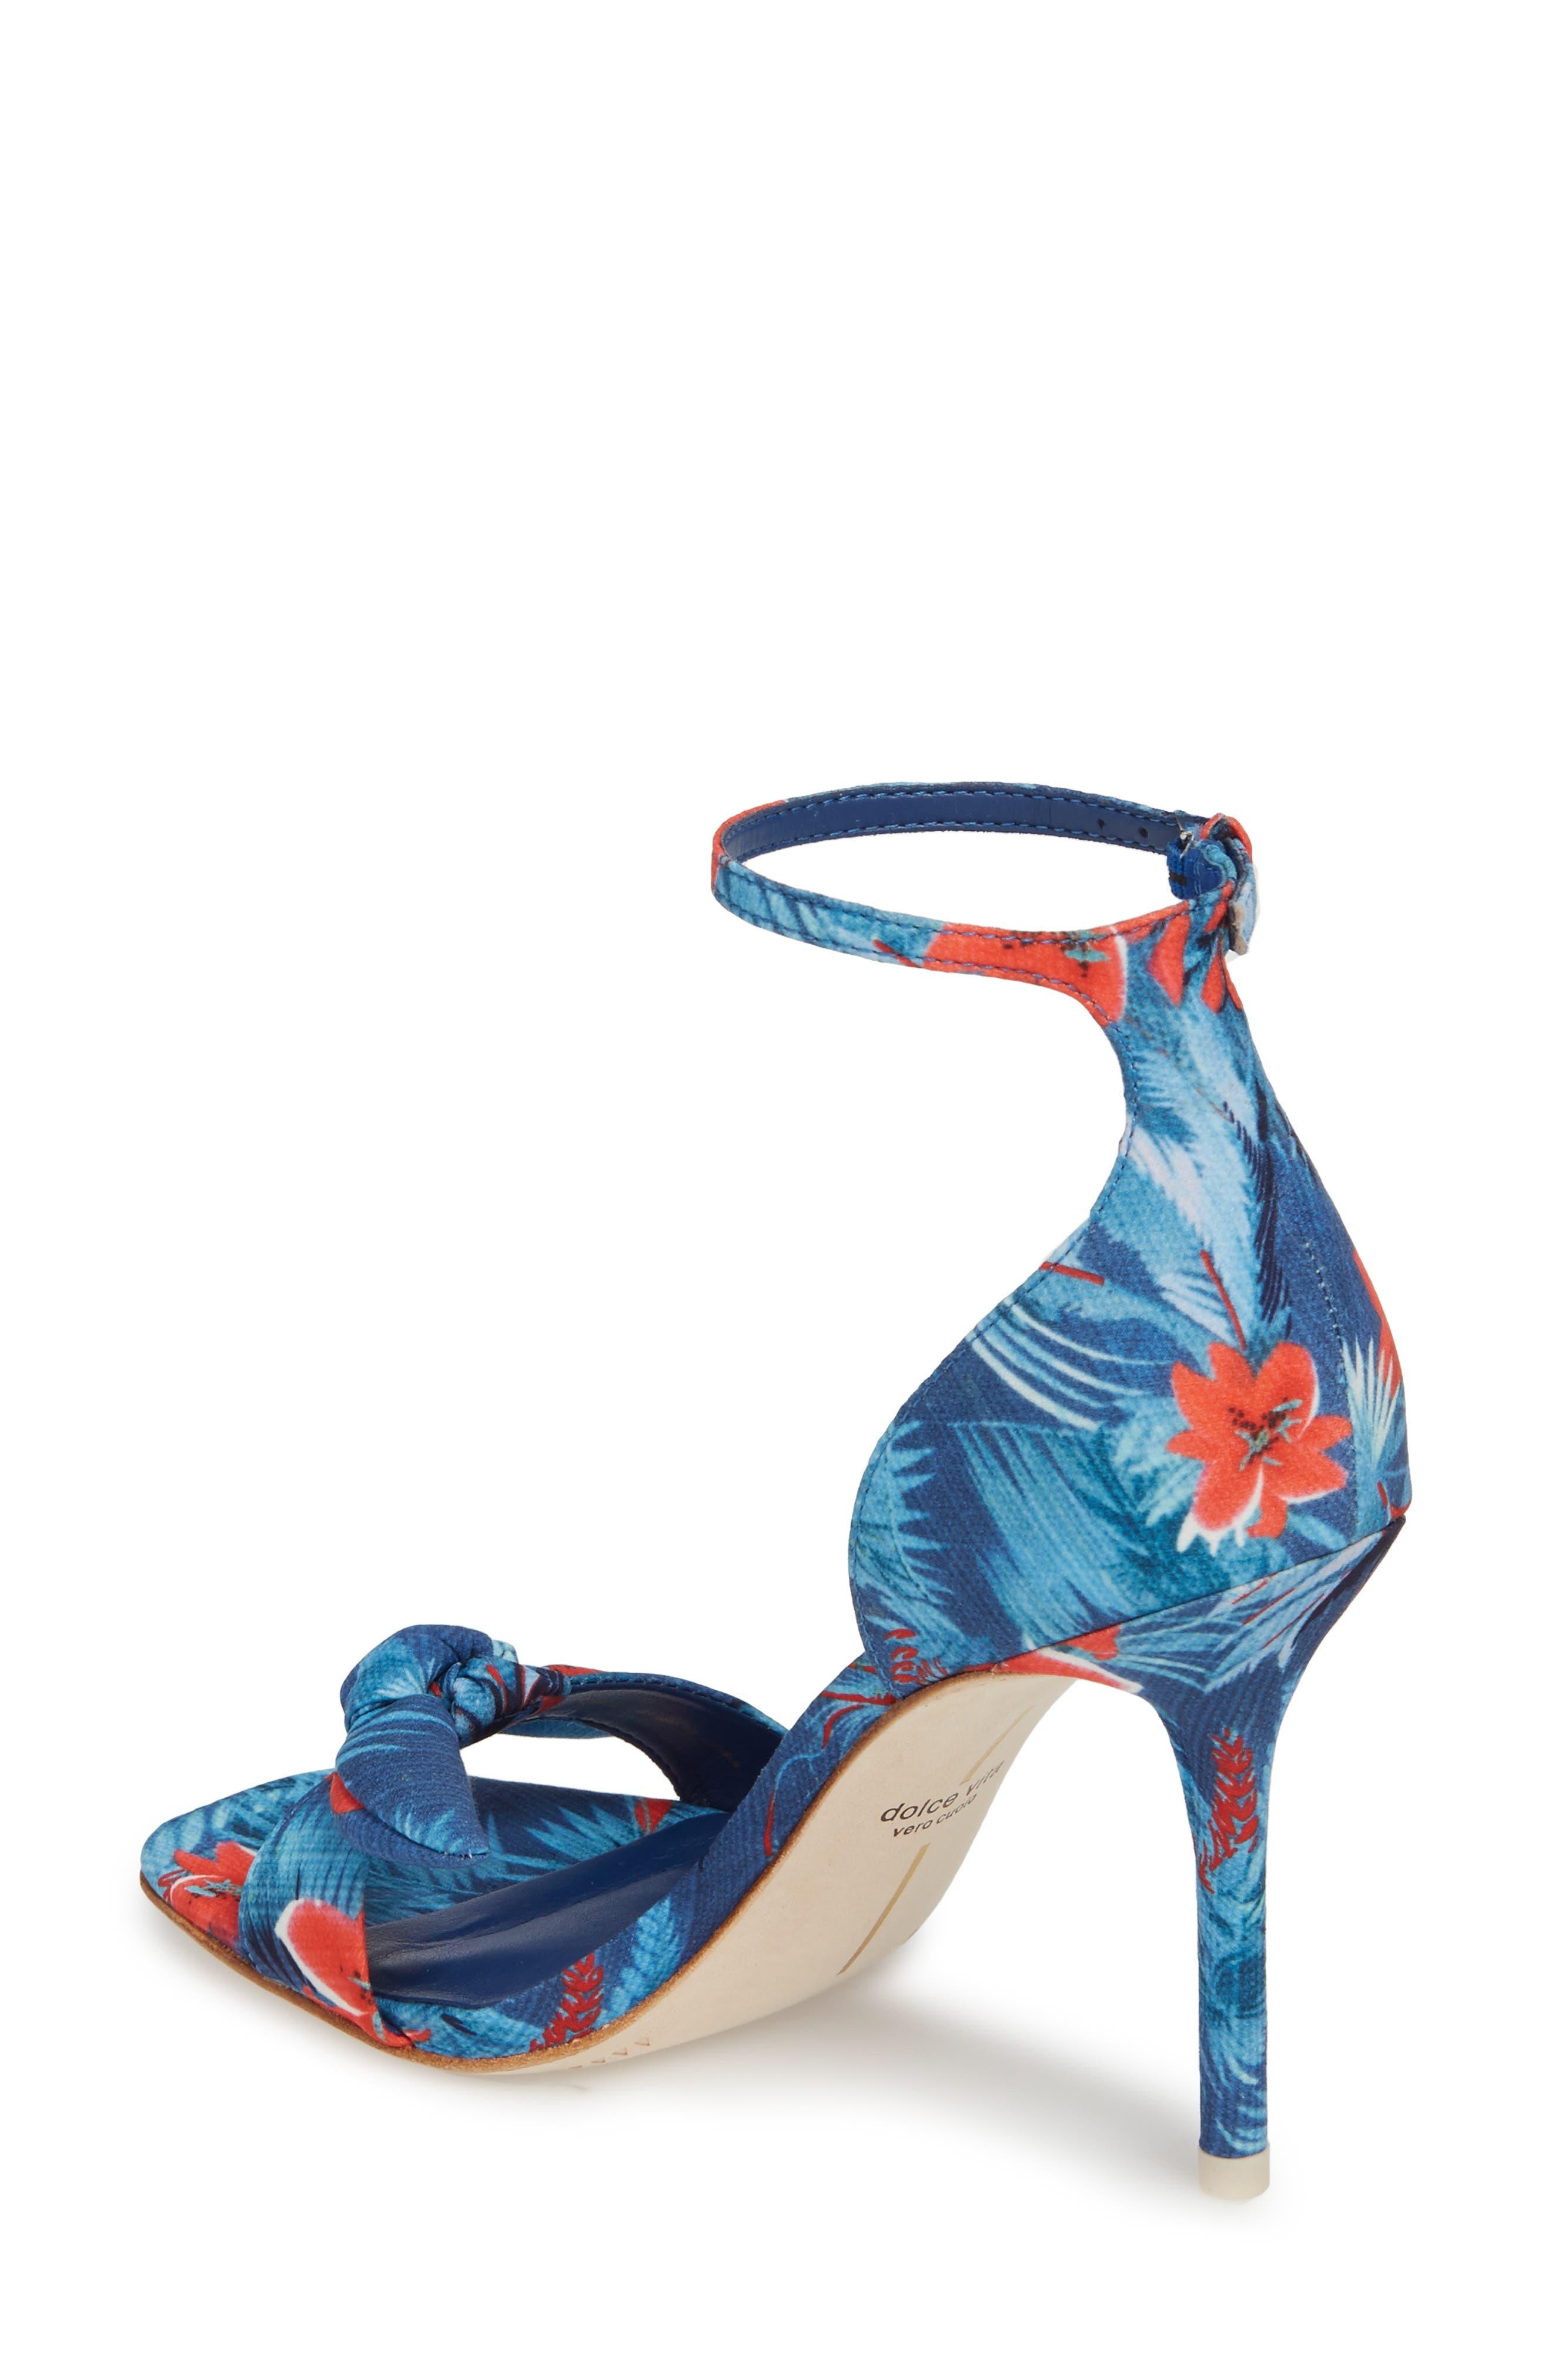 Helana Knotted Sandal,                             Alternate thumbnail 2, color,                             Blue Multi